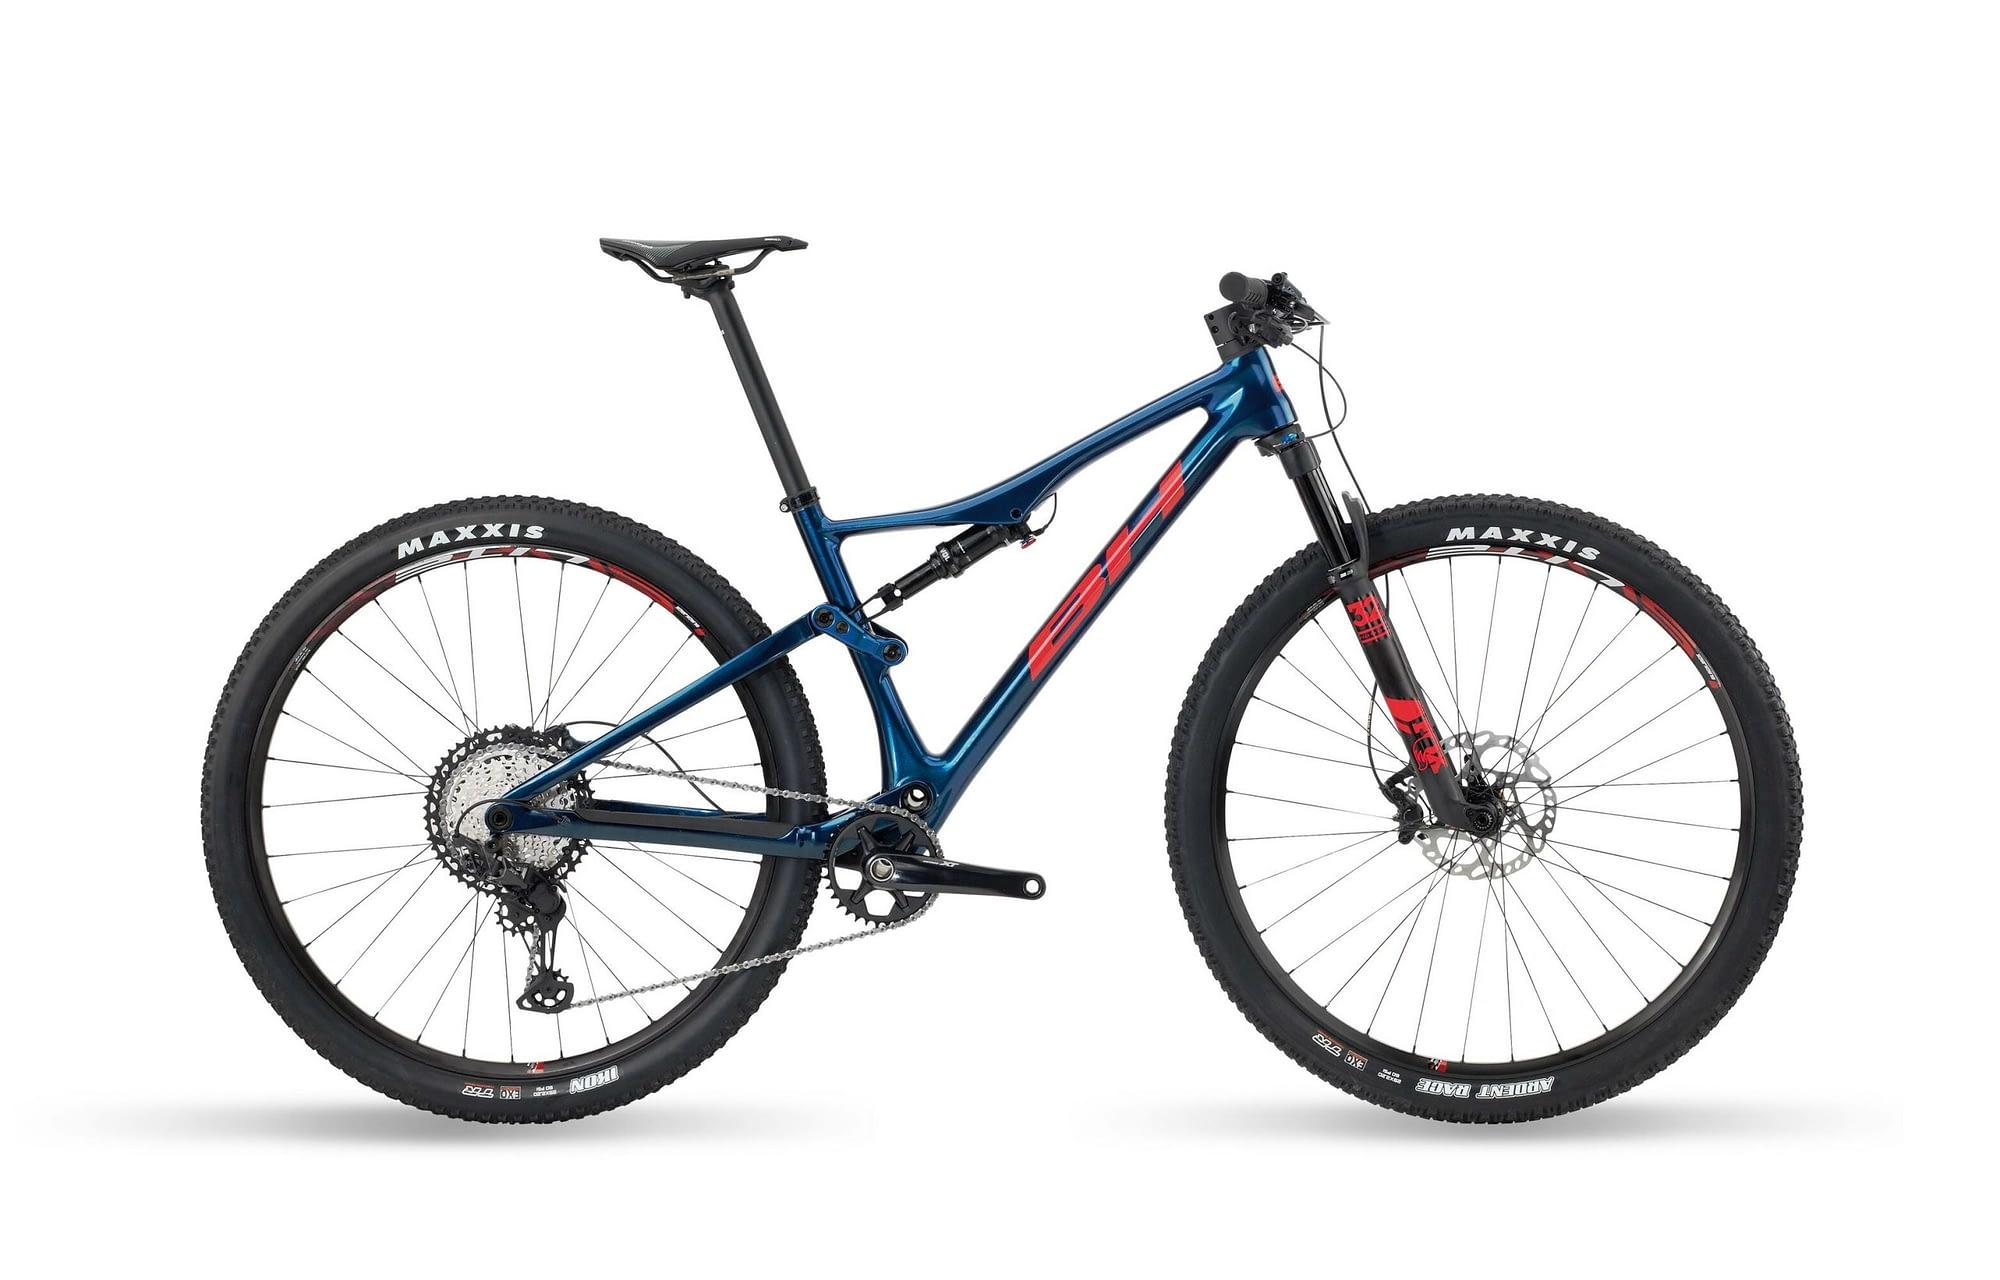 BH LYNX RACE EVO CARBON 8.0 - Rouge / Bleu, XL